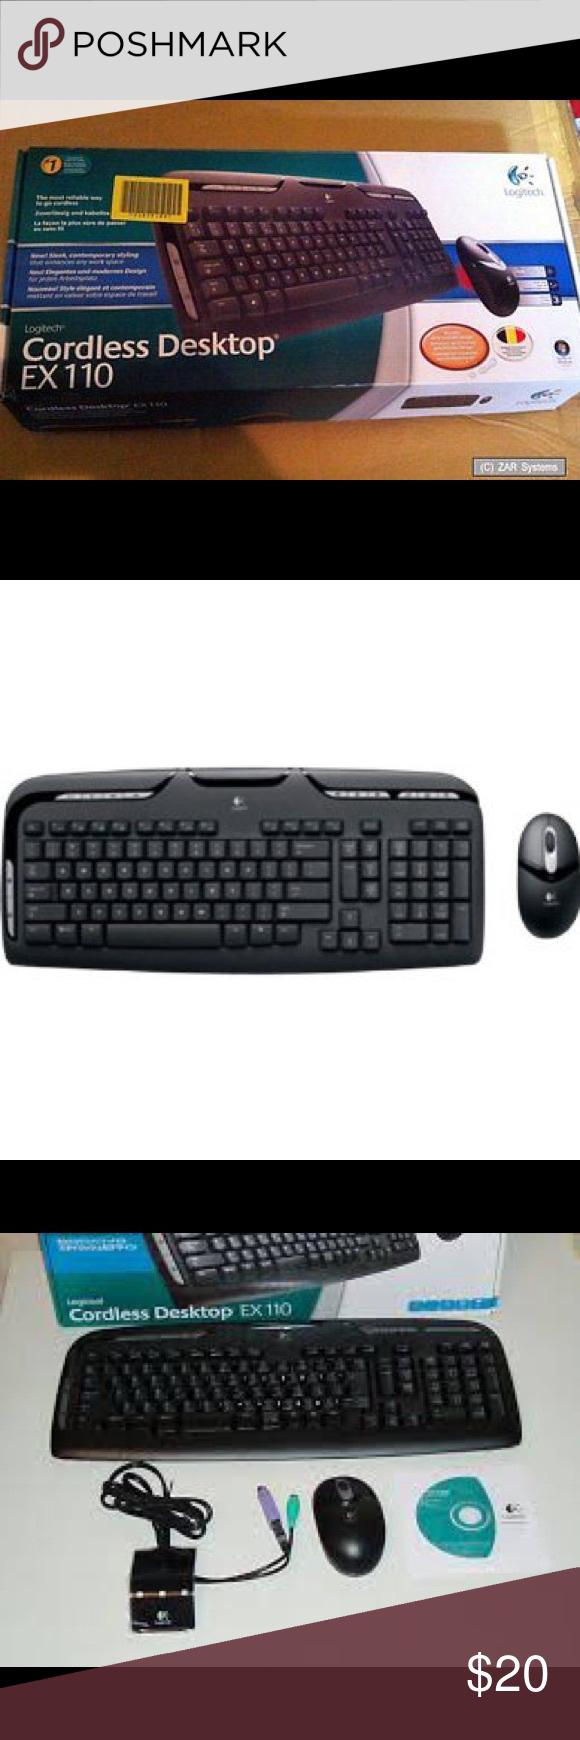 CORDLESS KEYBOARD W MOUSE LOGITECH EX110 NIB Cordless Desktop Keyboard